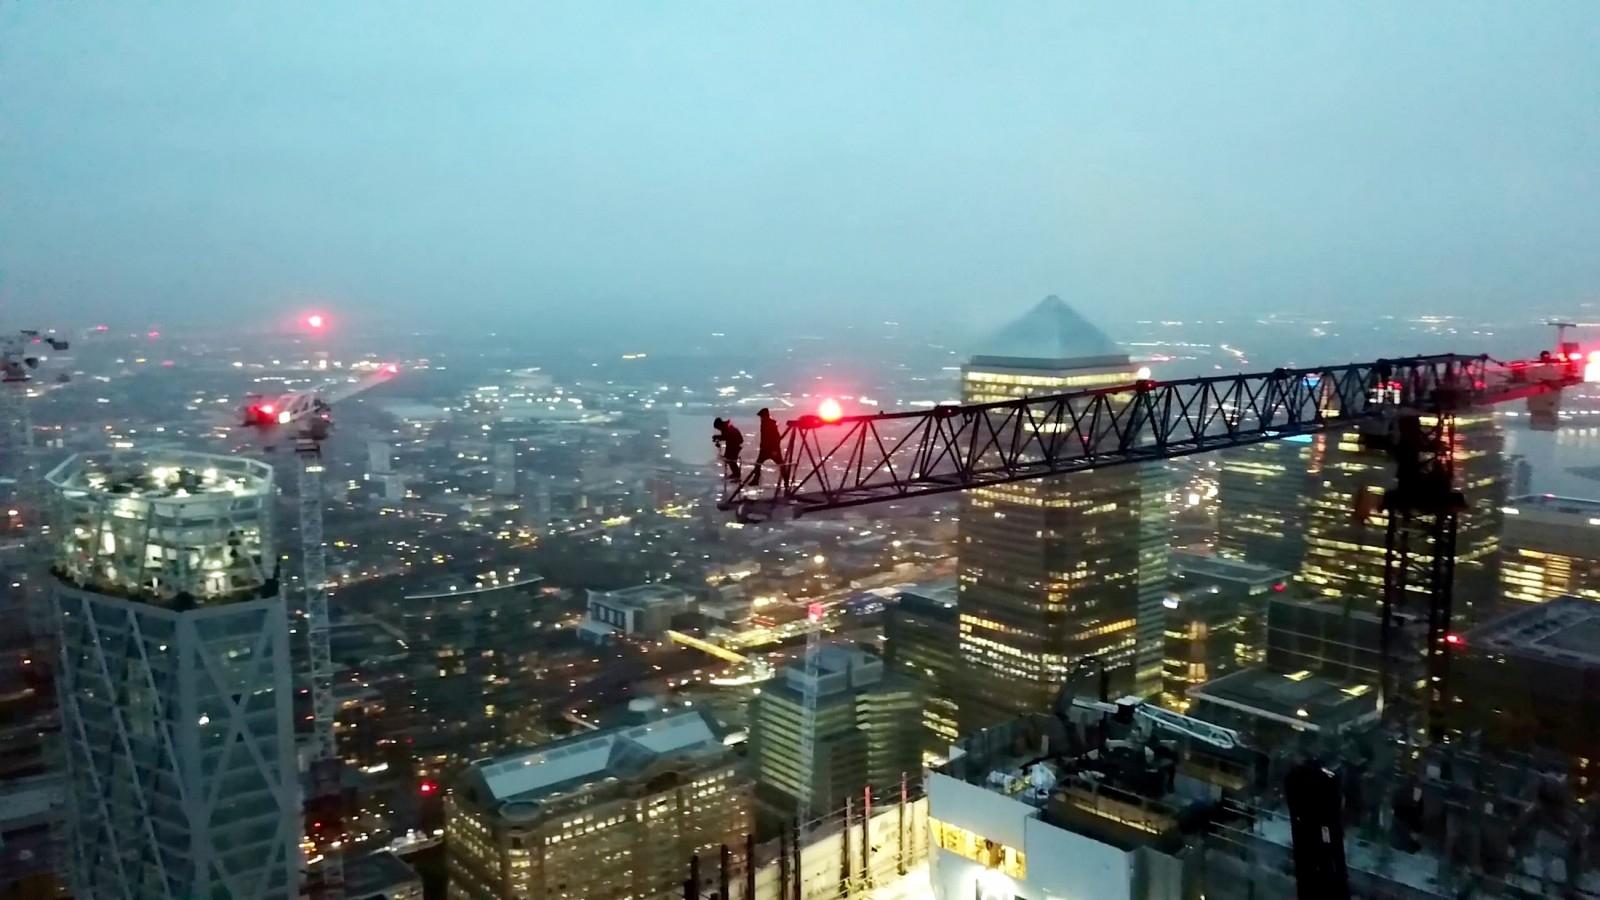 Two Adrenaline Junkies Cheat Death Climbing 784ft London Skyscraper